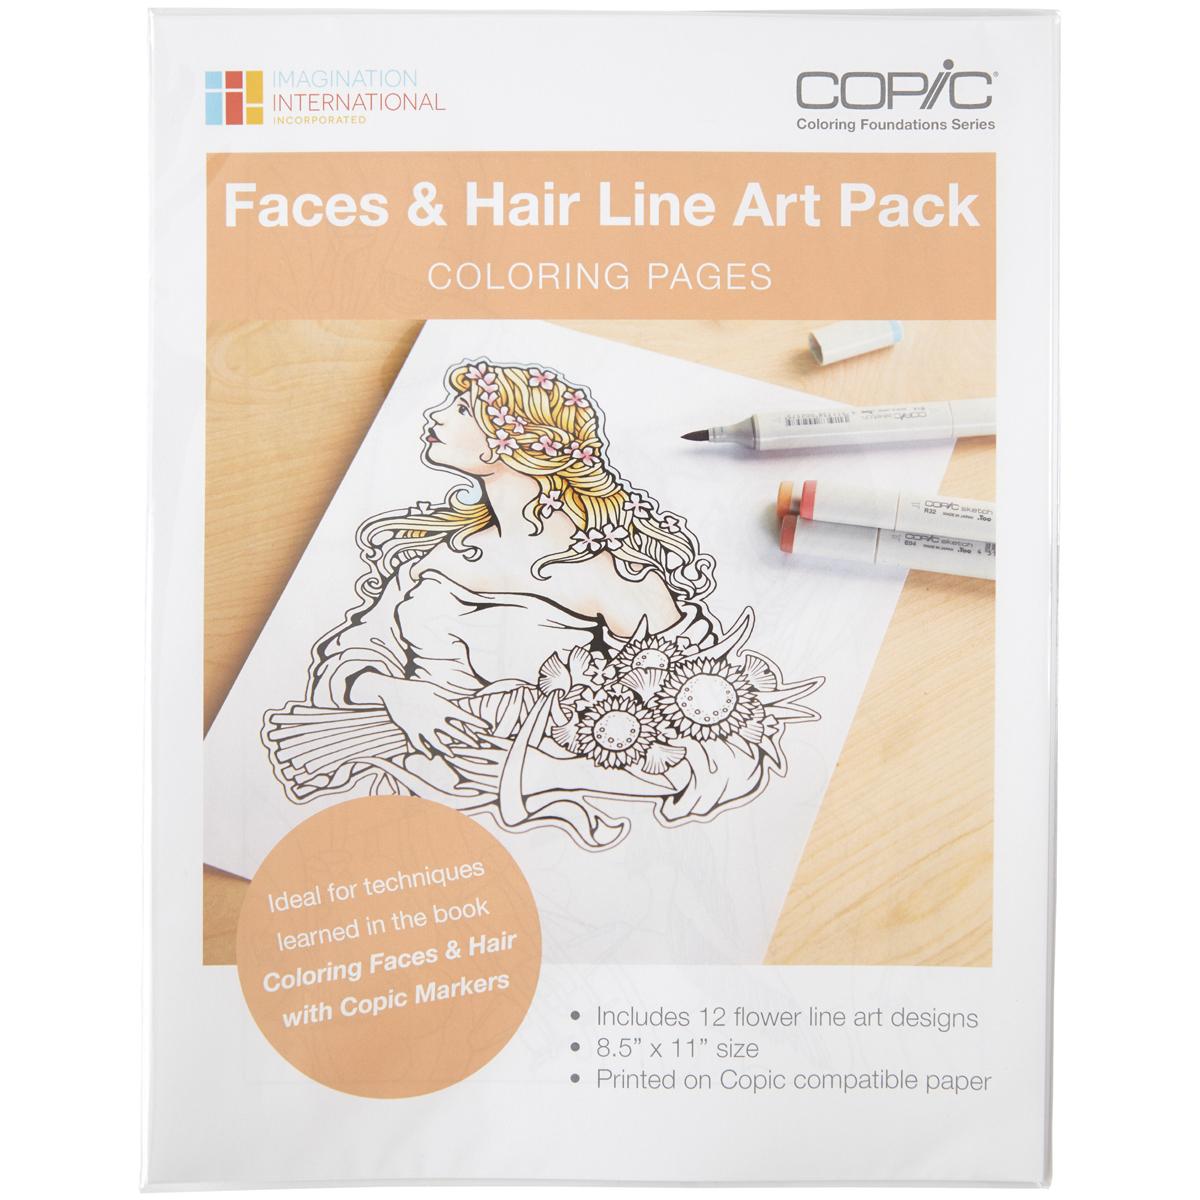 Faces & Hair Line Art Pack